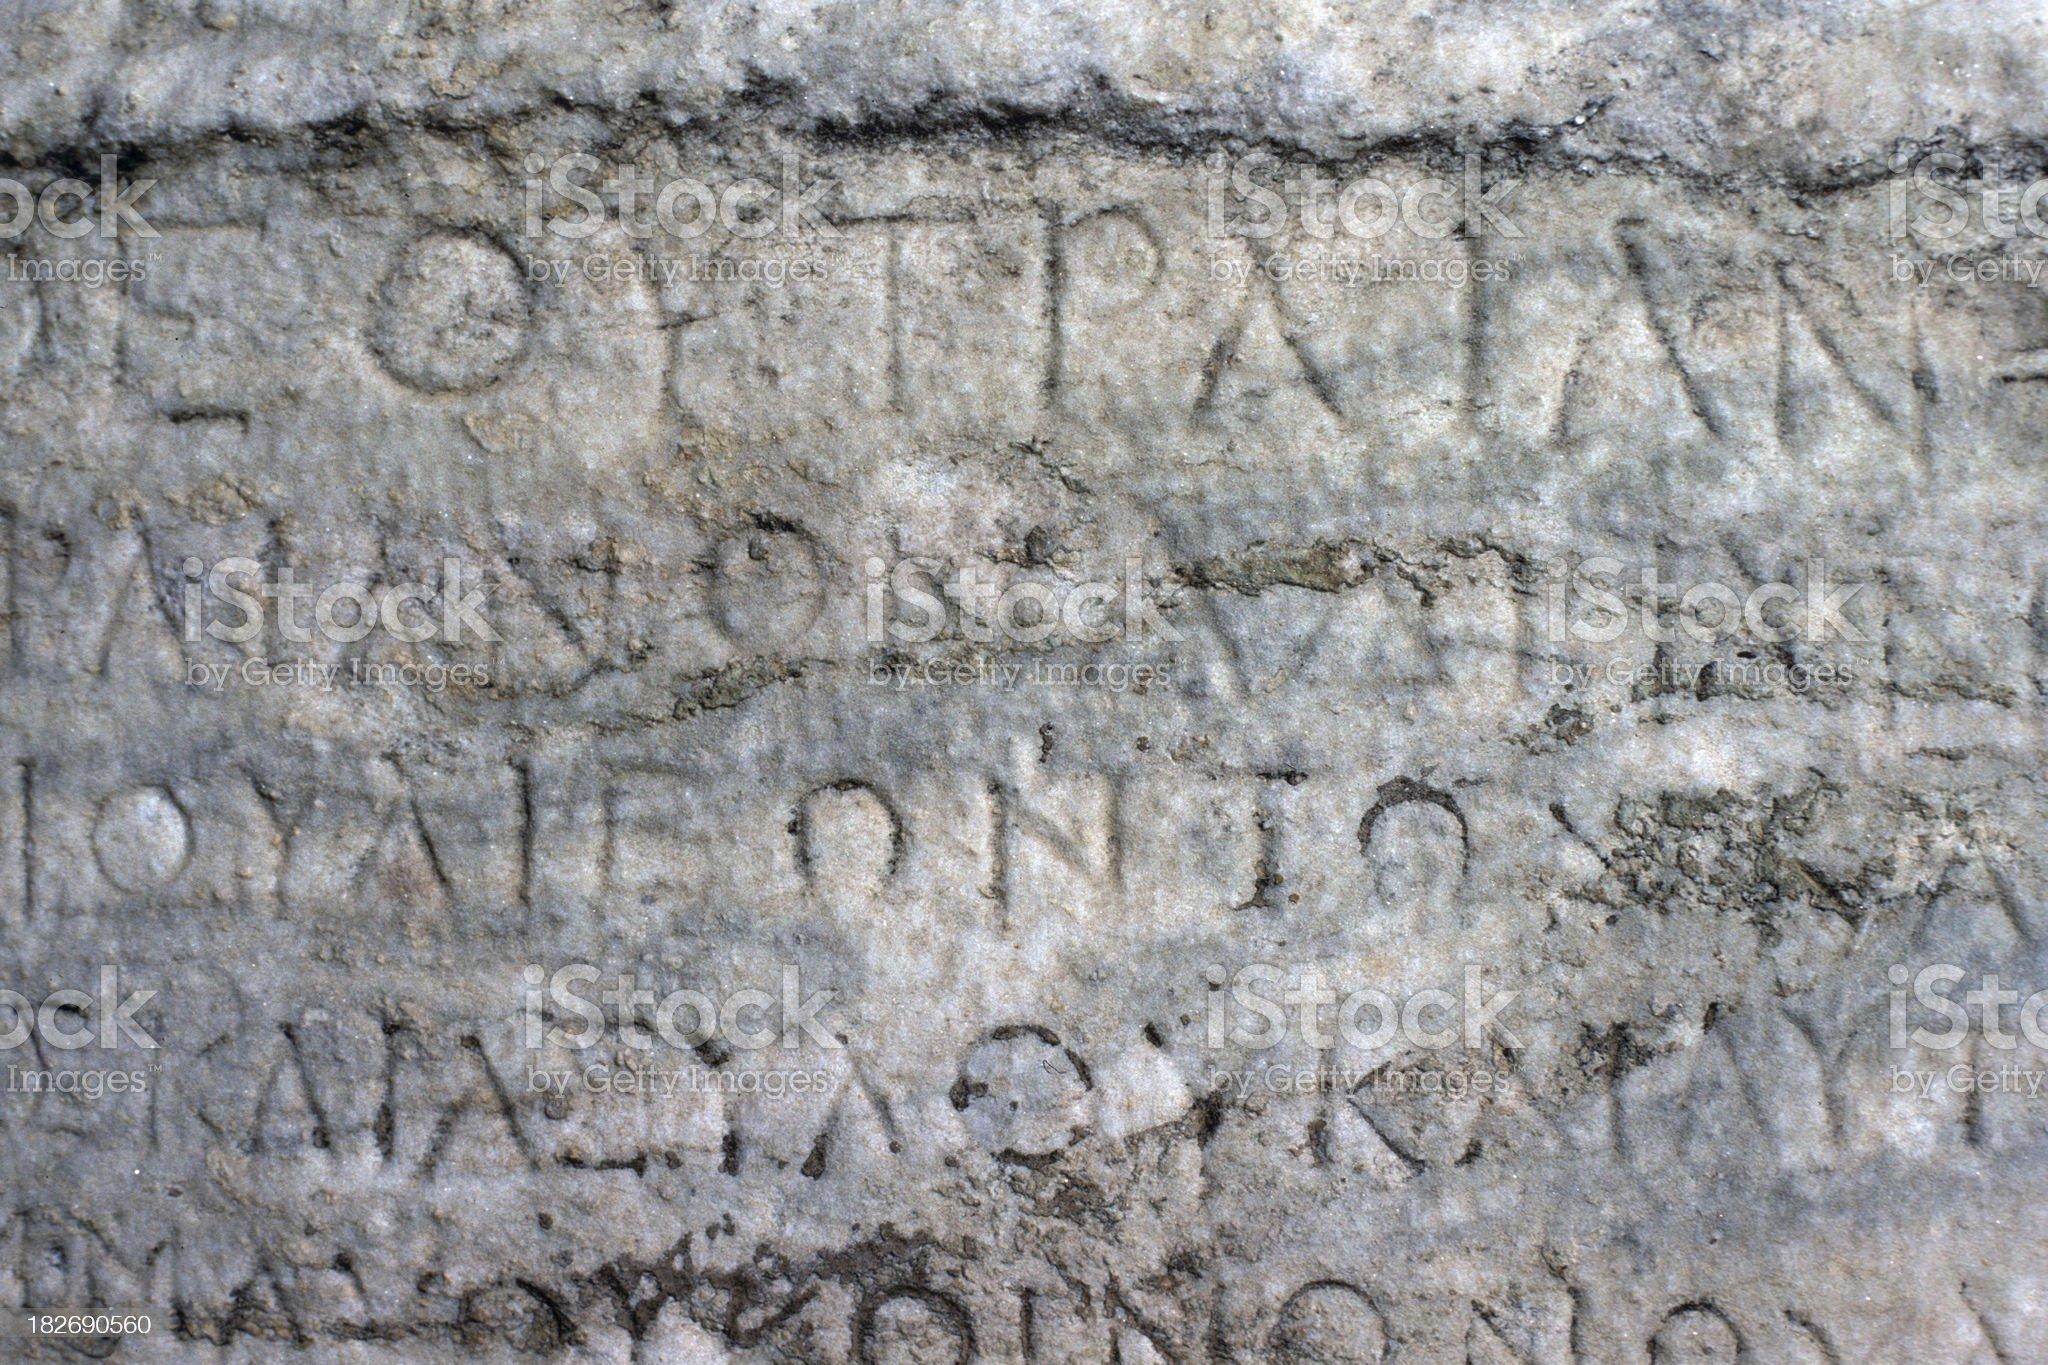 Ancient Greek Inscriptions royalty-free stock photo